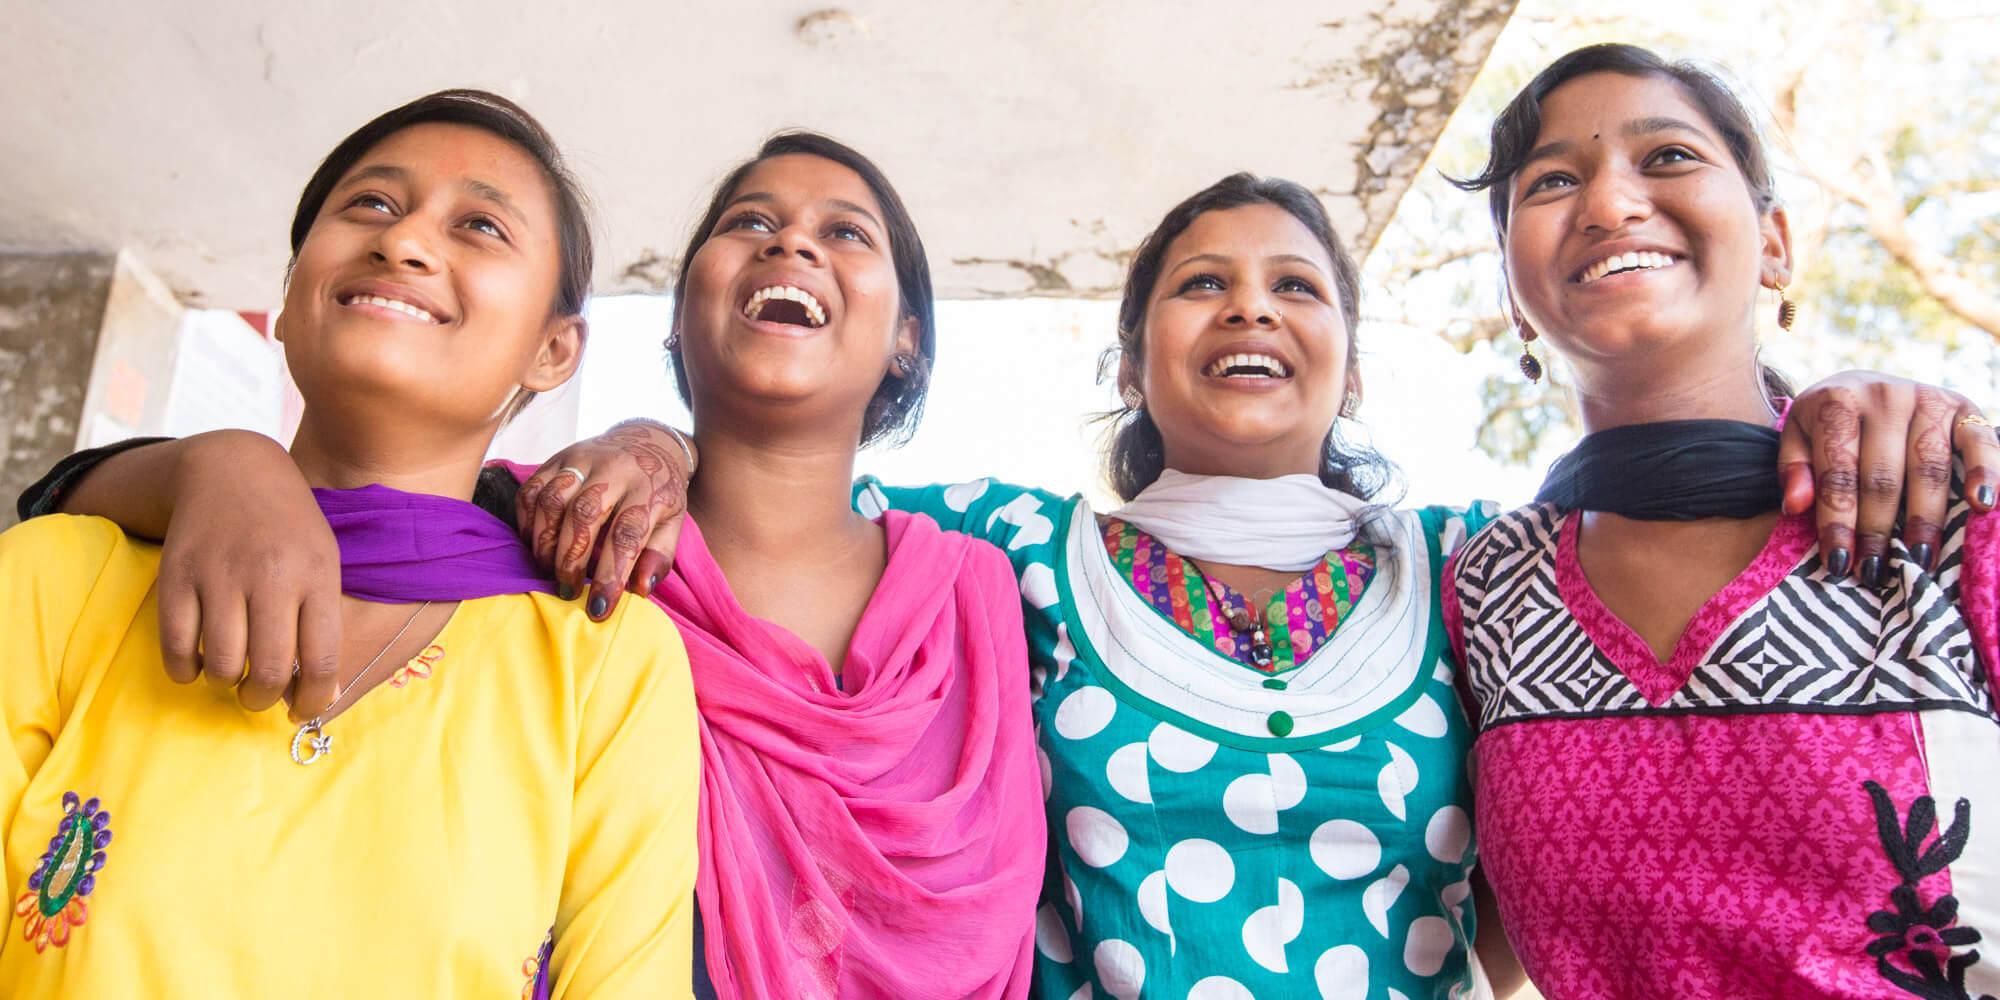 EngenderHealth, girls, friends, Jharkhand, India, ARSH